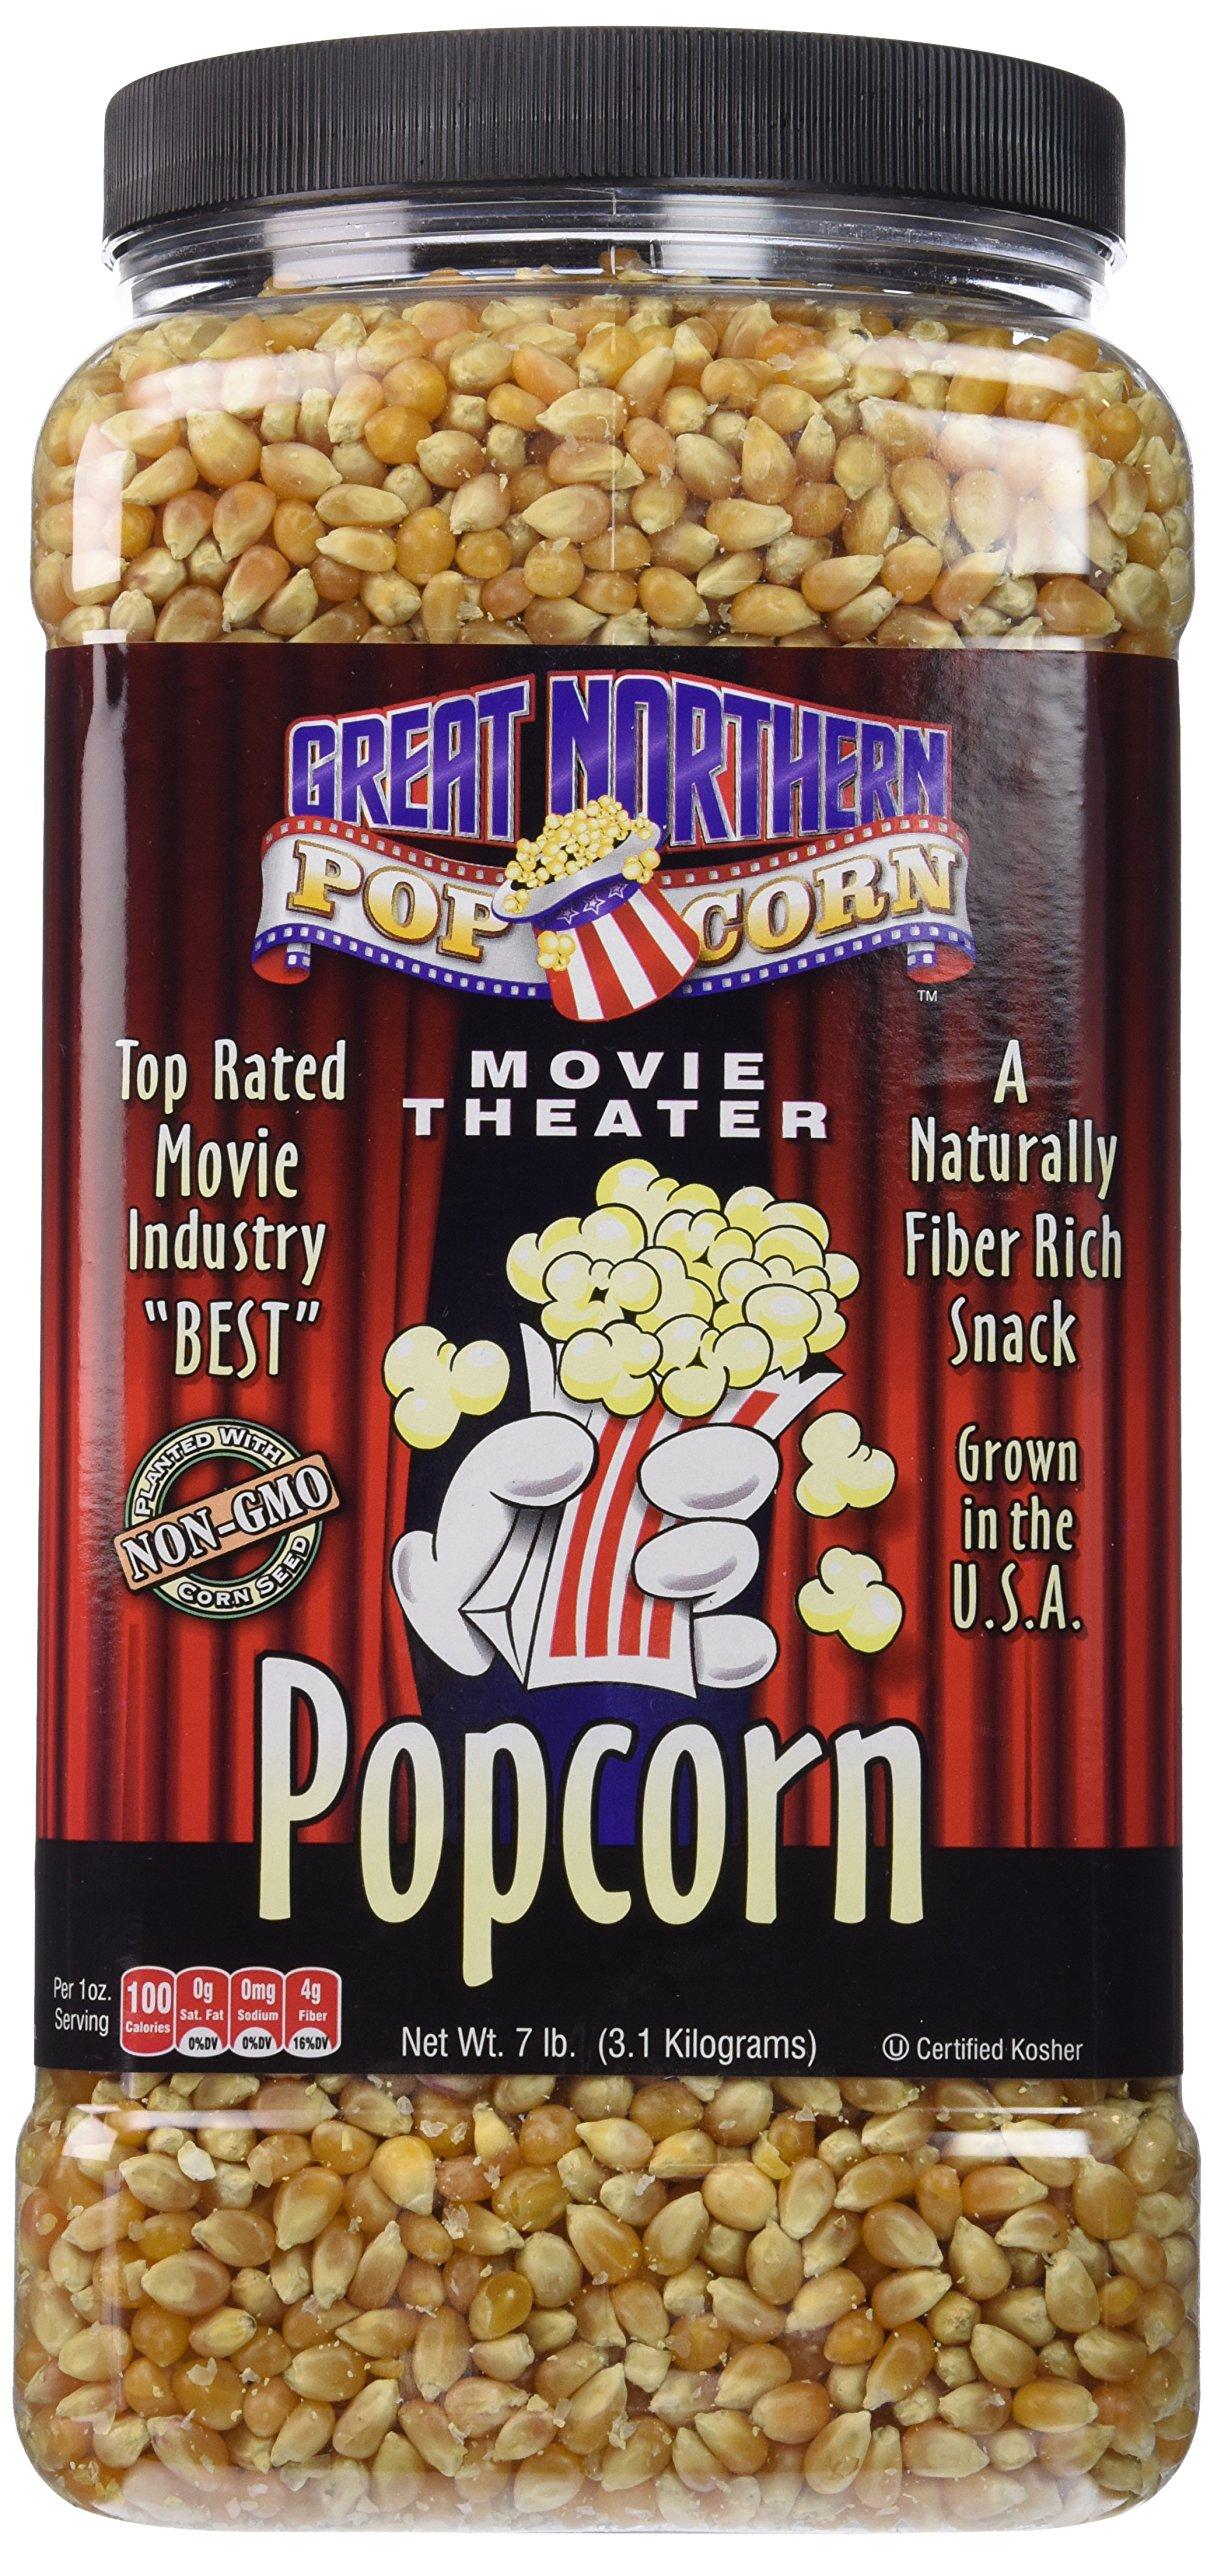 Great Northern Popcorn Premium Yellow Gourmet Popcorn, 7 Pound Jug by Great Northern Popcorn Company